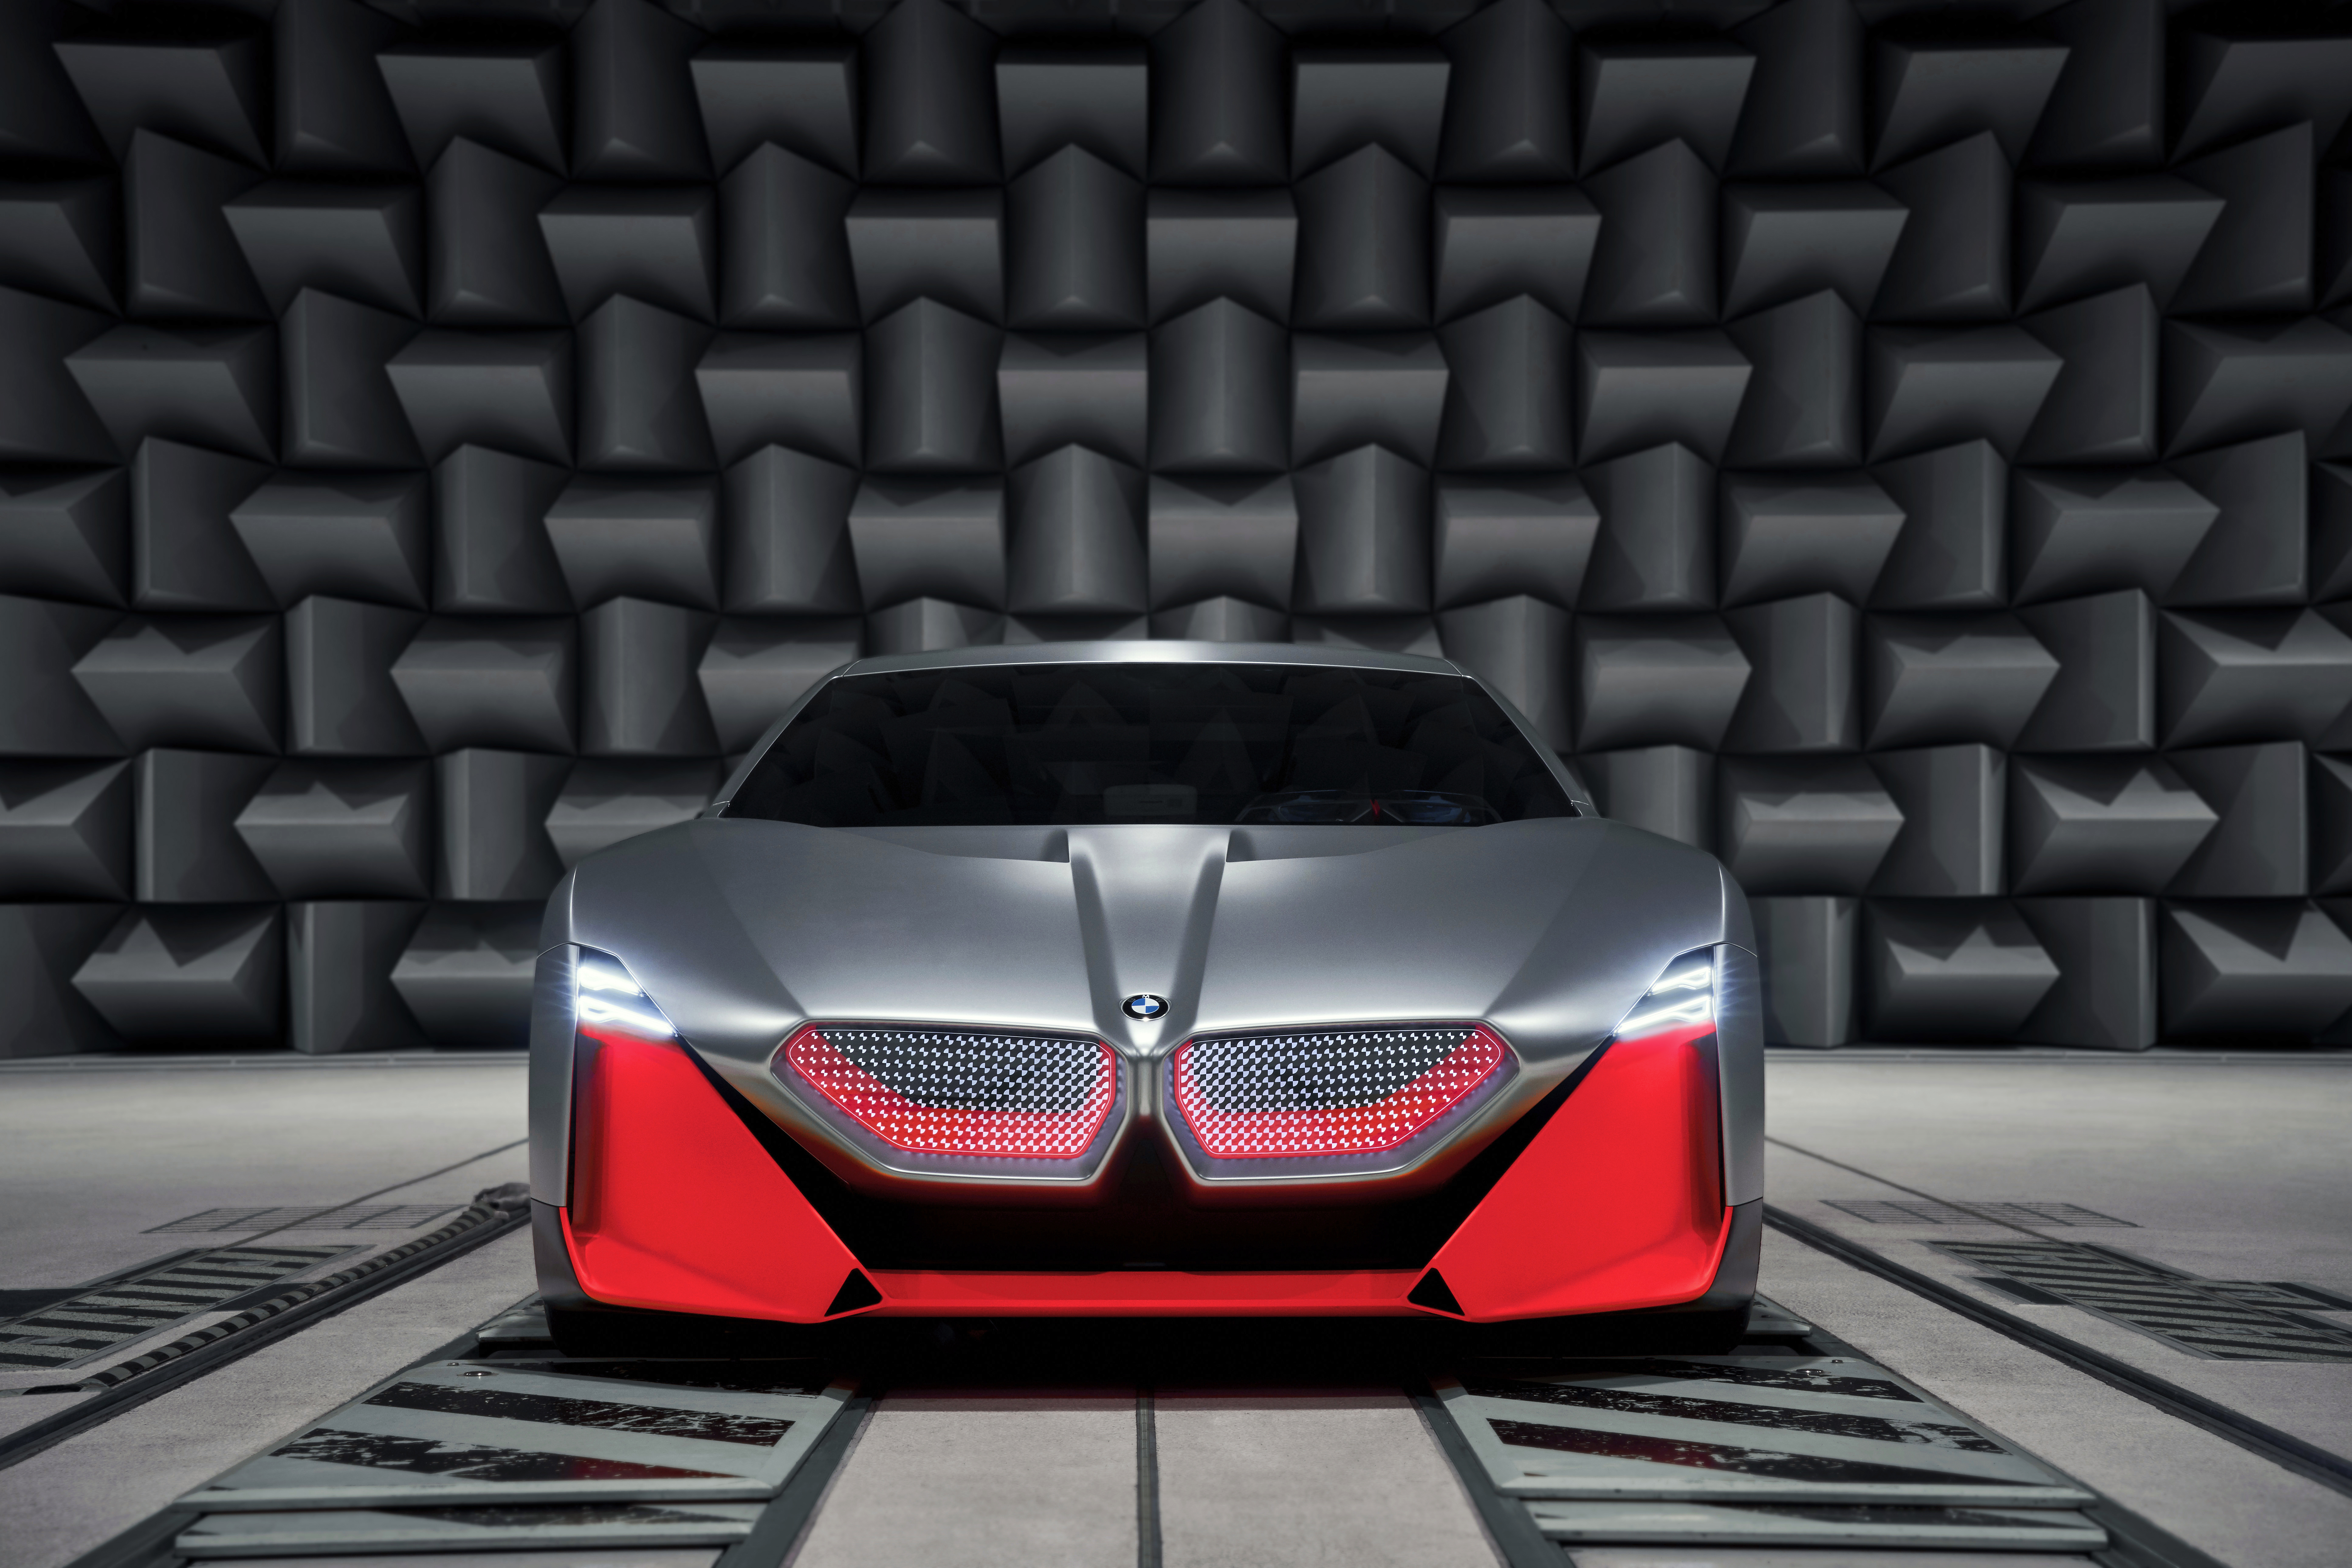 bmw vision m next 2019 1577652468 - BMW Vision M NEXT 2019 - BMW Vision M NEXT 4k wallpaper